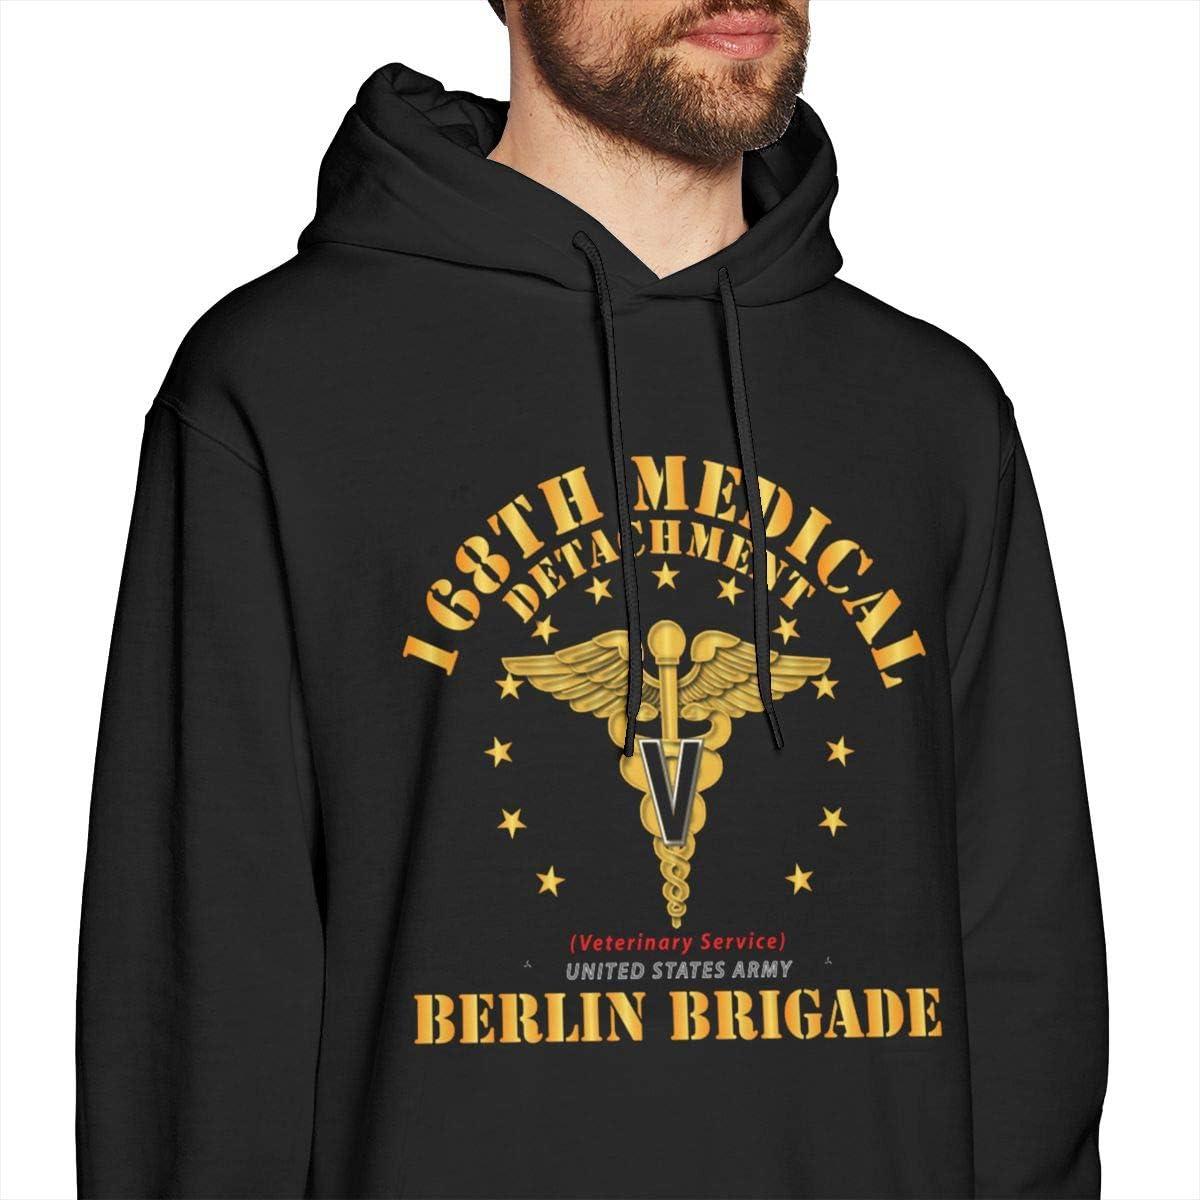 168th Medical Detachment Berlin Brigade Mens Pullover Hoodies Casual Hooded Sweatshirt